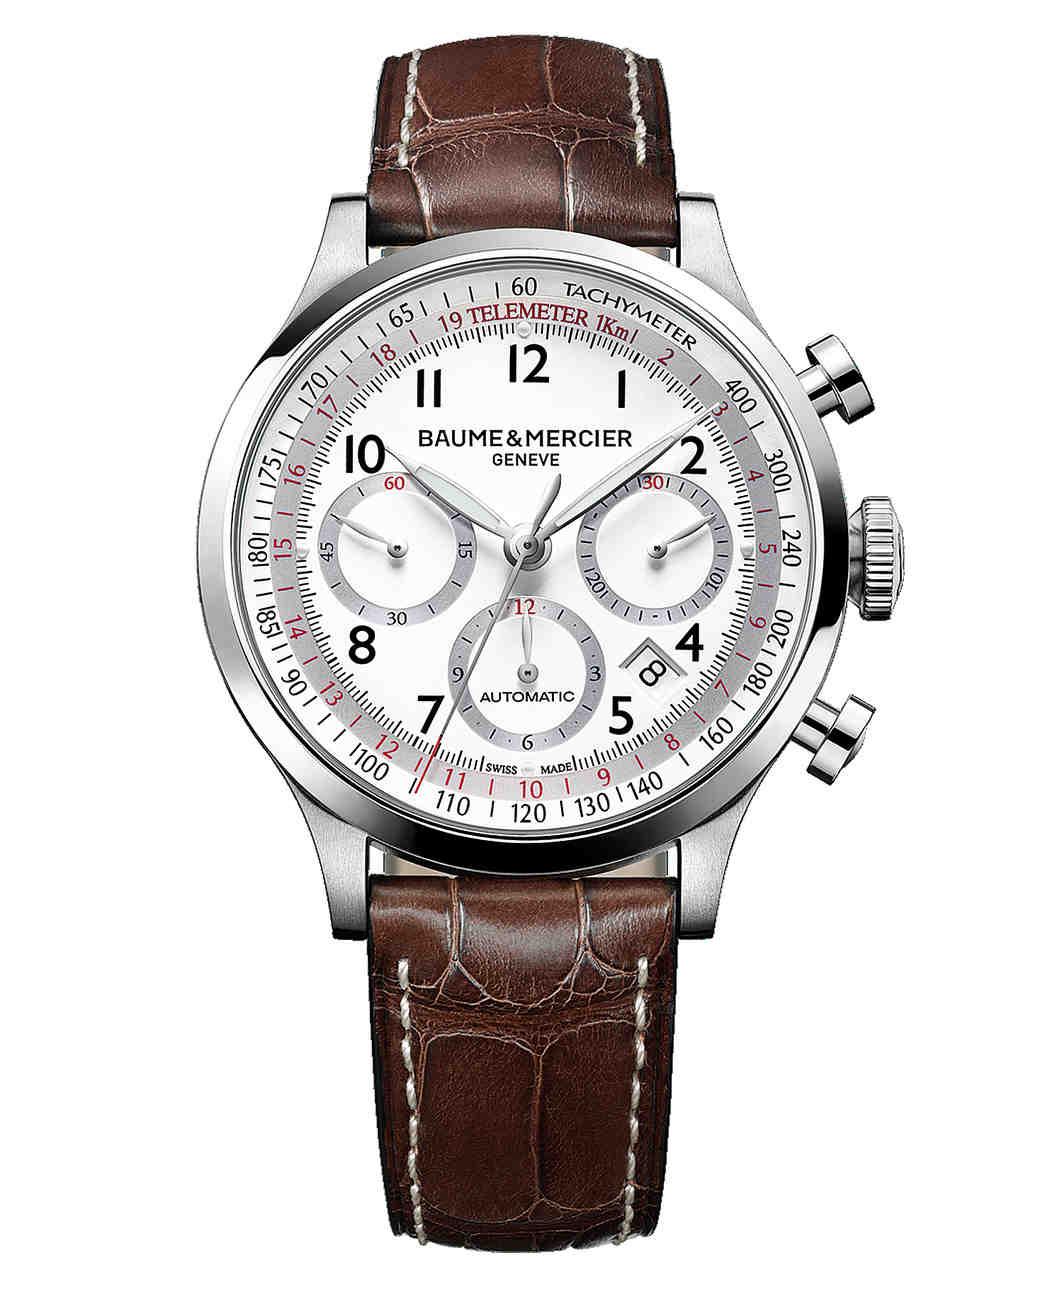 baume-mercier-watch-capeland-10082-0514.jpg